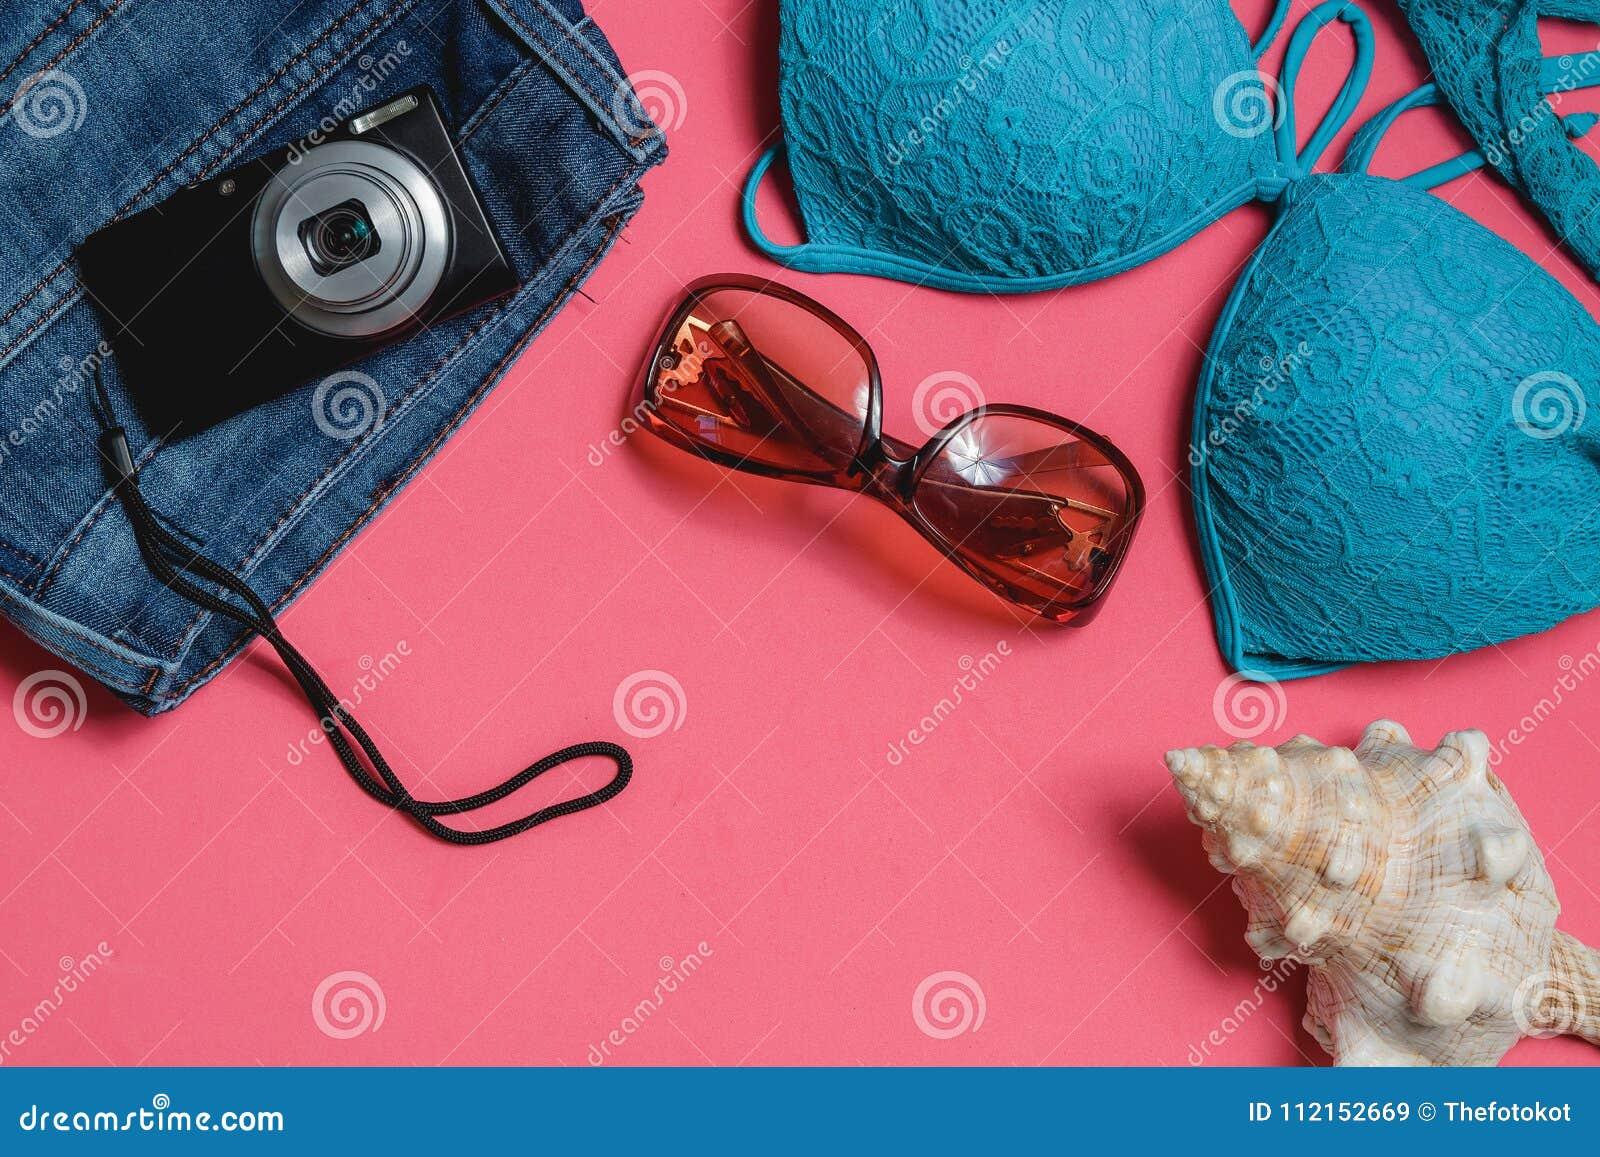 Costume Da Bagno Conchiglia : Costume da bagno jeans occhiali da sole macchina fotografica